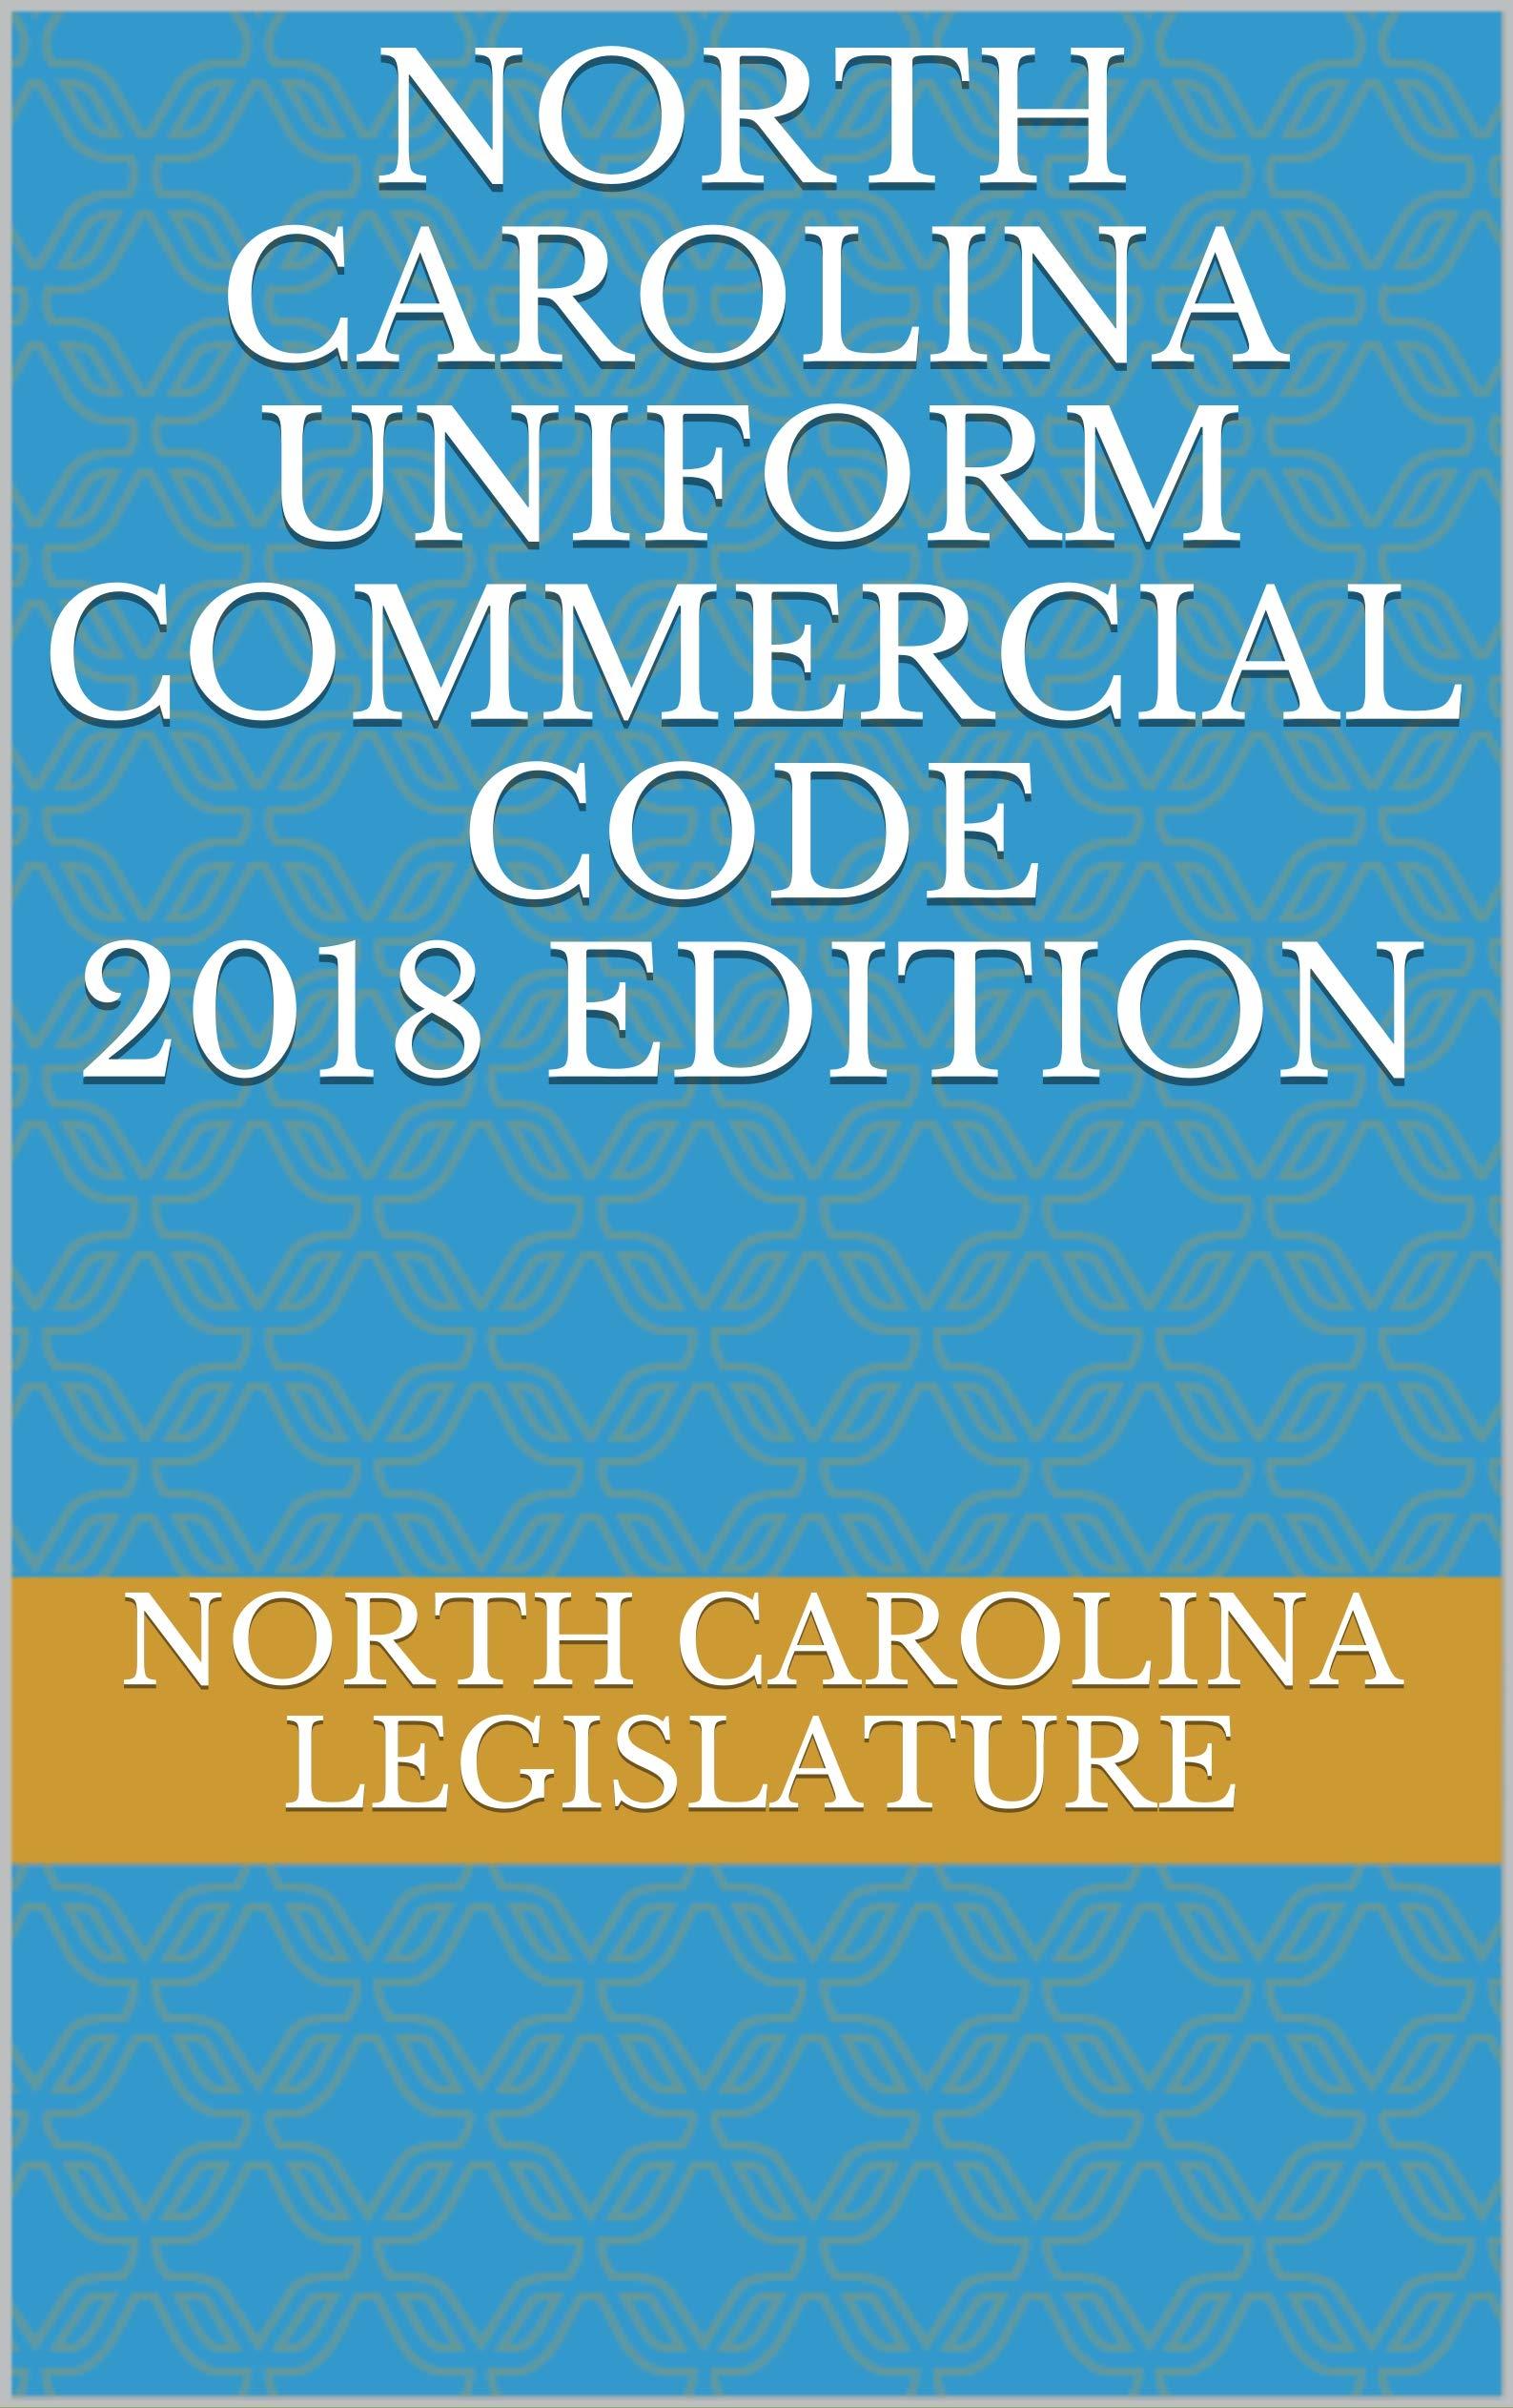 NORTH CAROLINA UNIFORM COMMERCIAL CODE 2018 EDITION